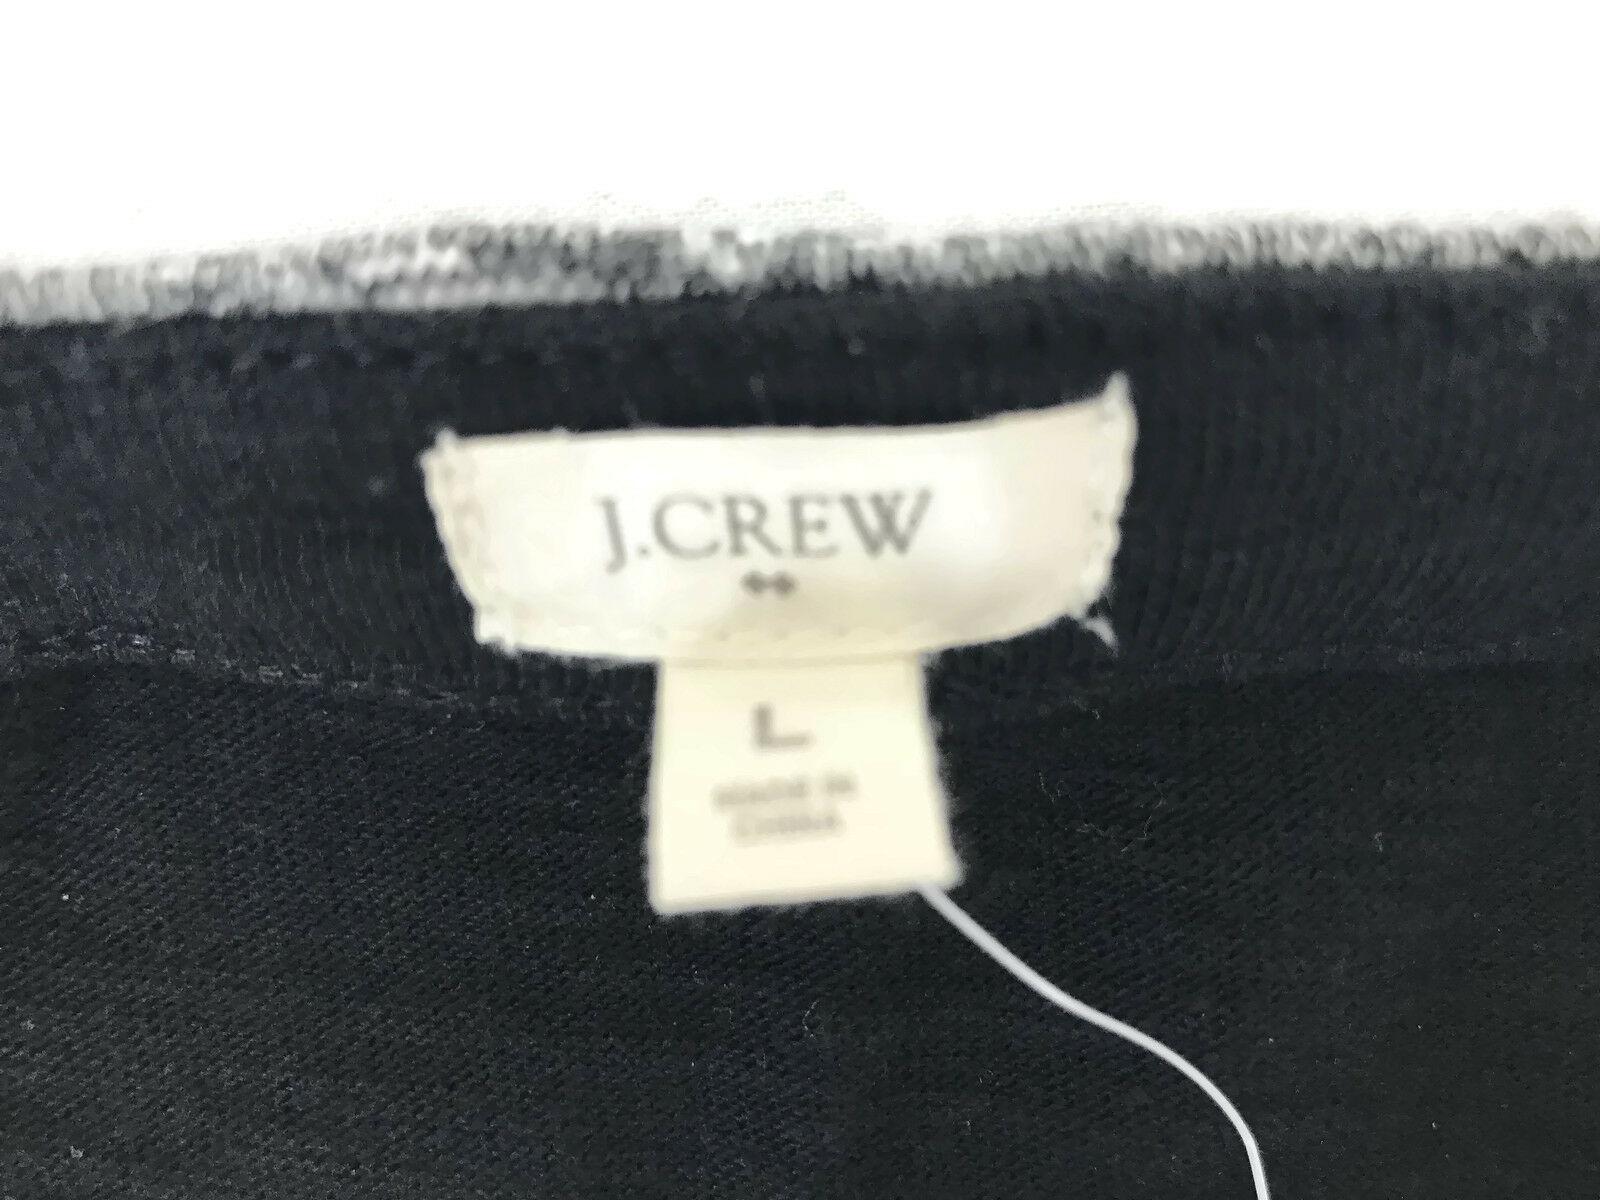 J. Crew Factory Dress Black Gray Stripe Boatneck 3/4 Sleeves Style 02665 Sz L U1 image 6